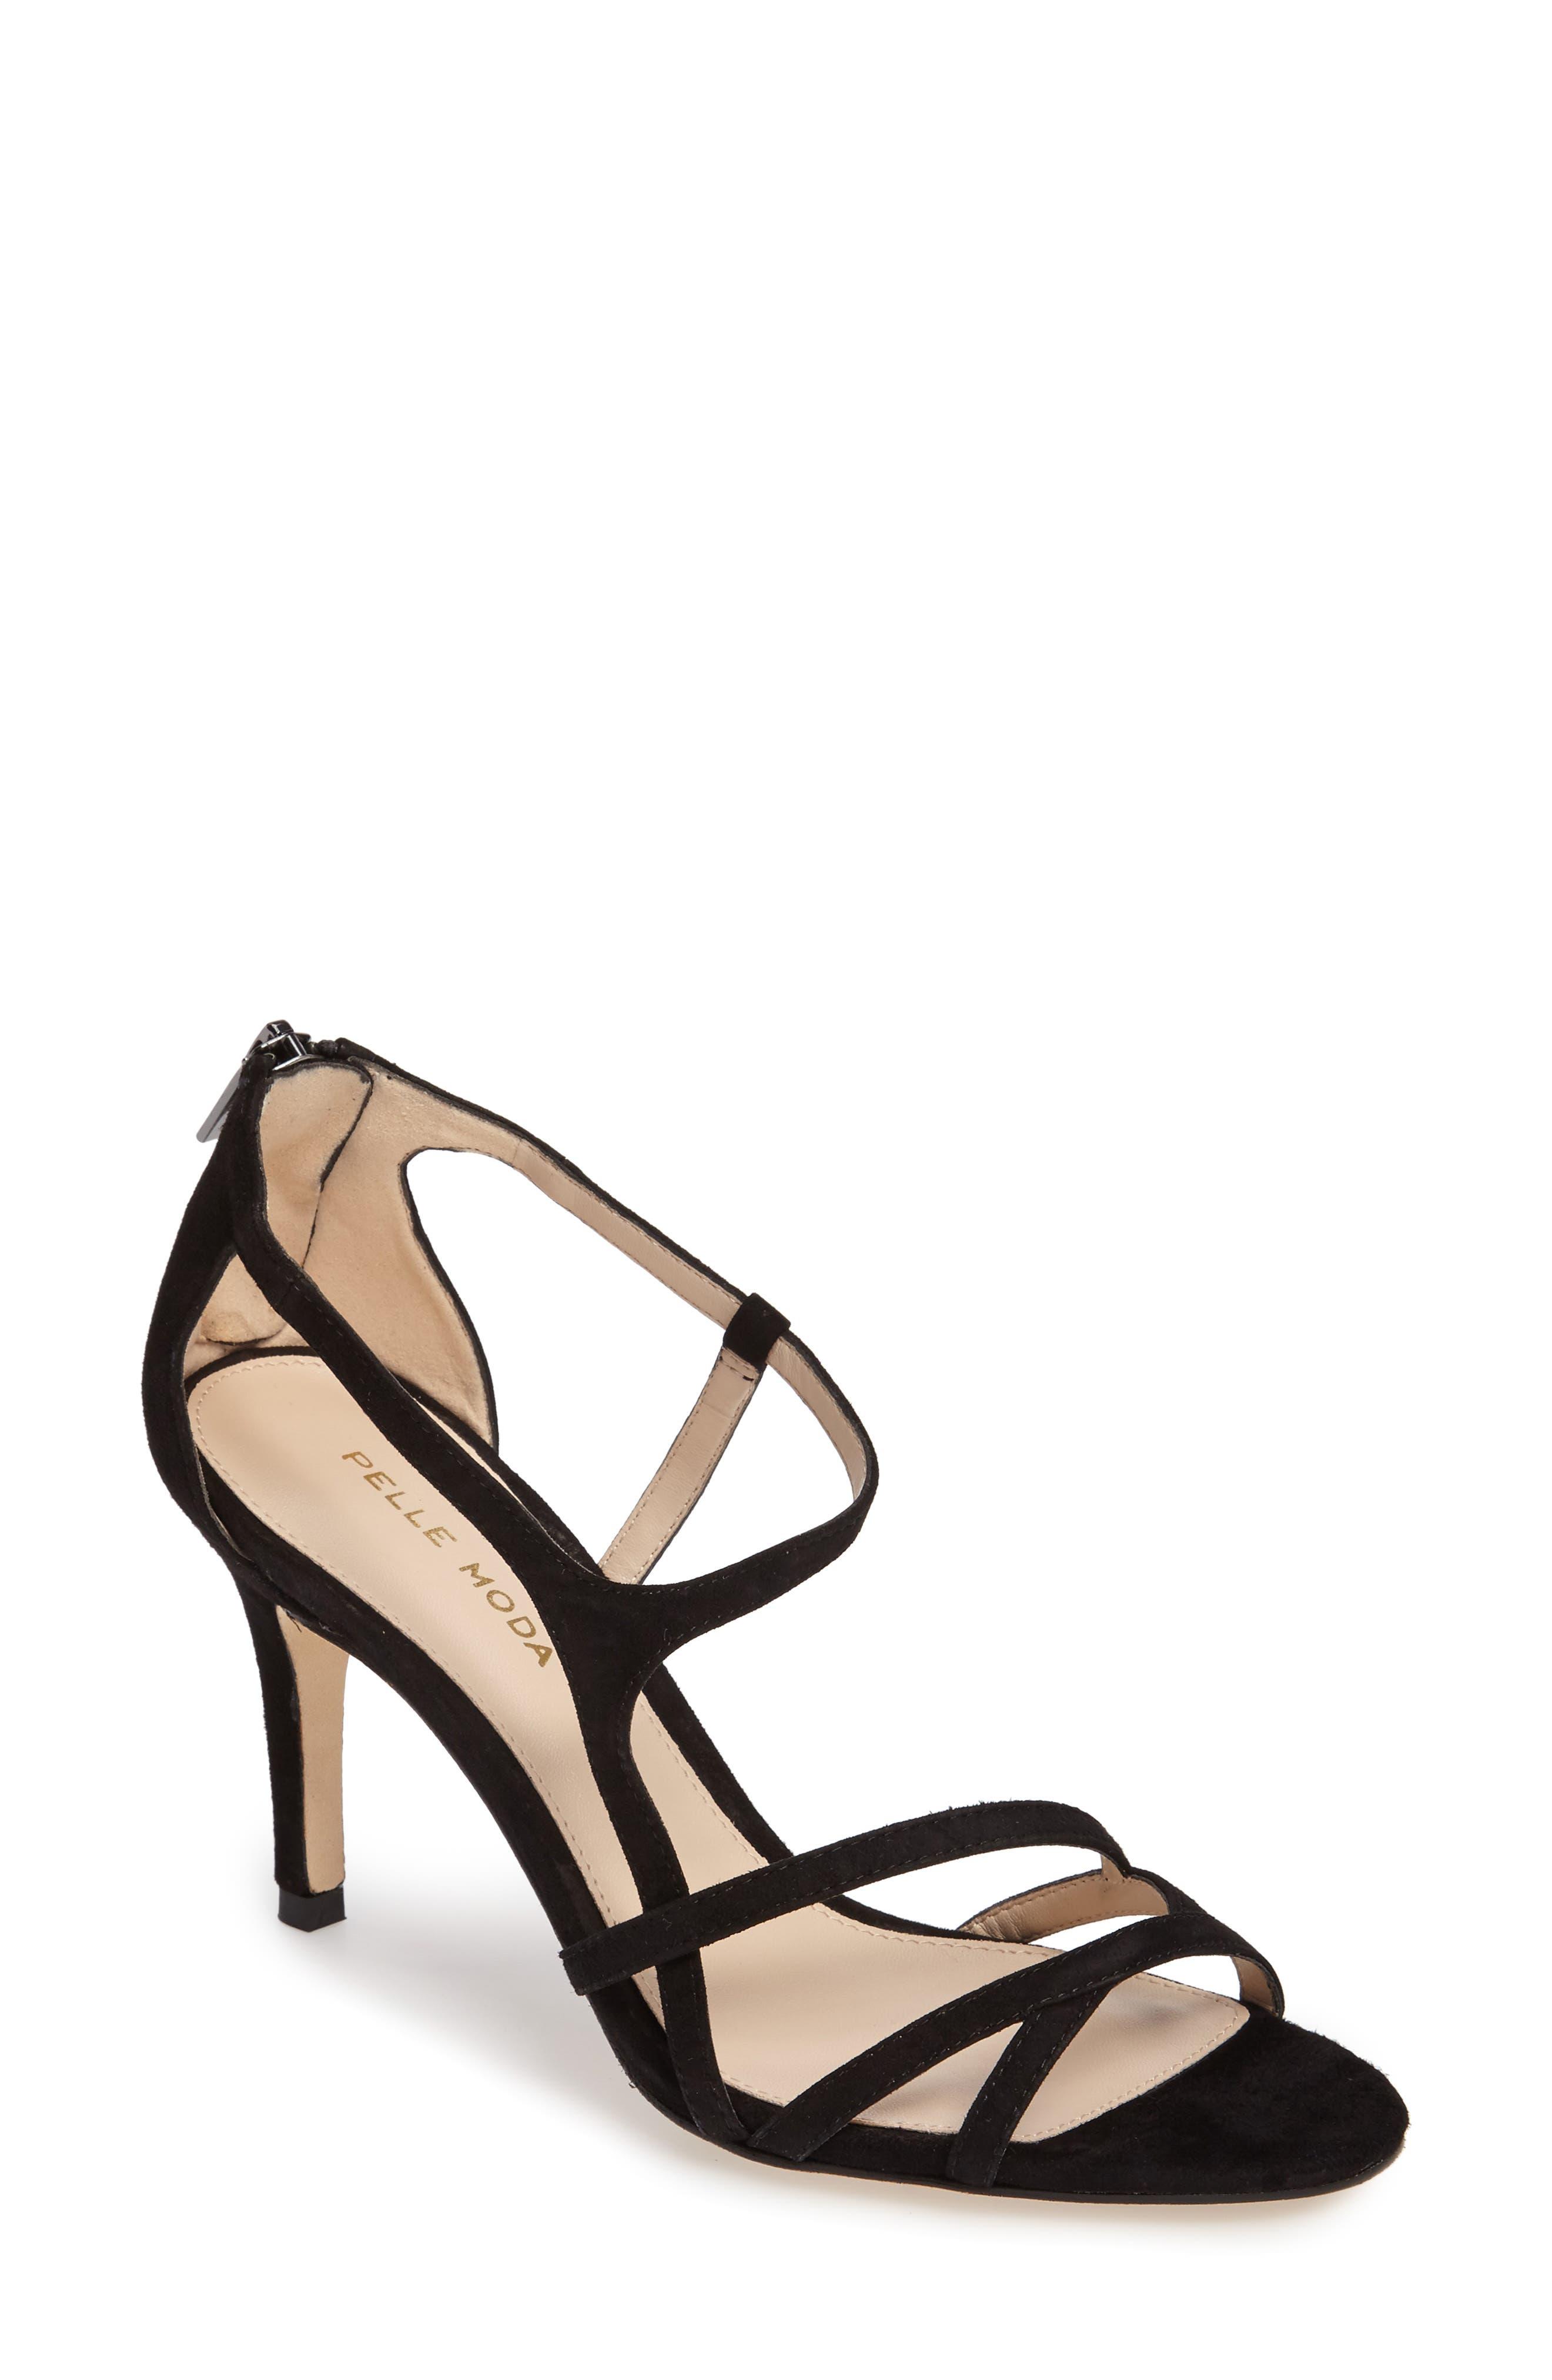 Ruby Asymmetrical Strappy Sandal,                         Main,                         color, 001